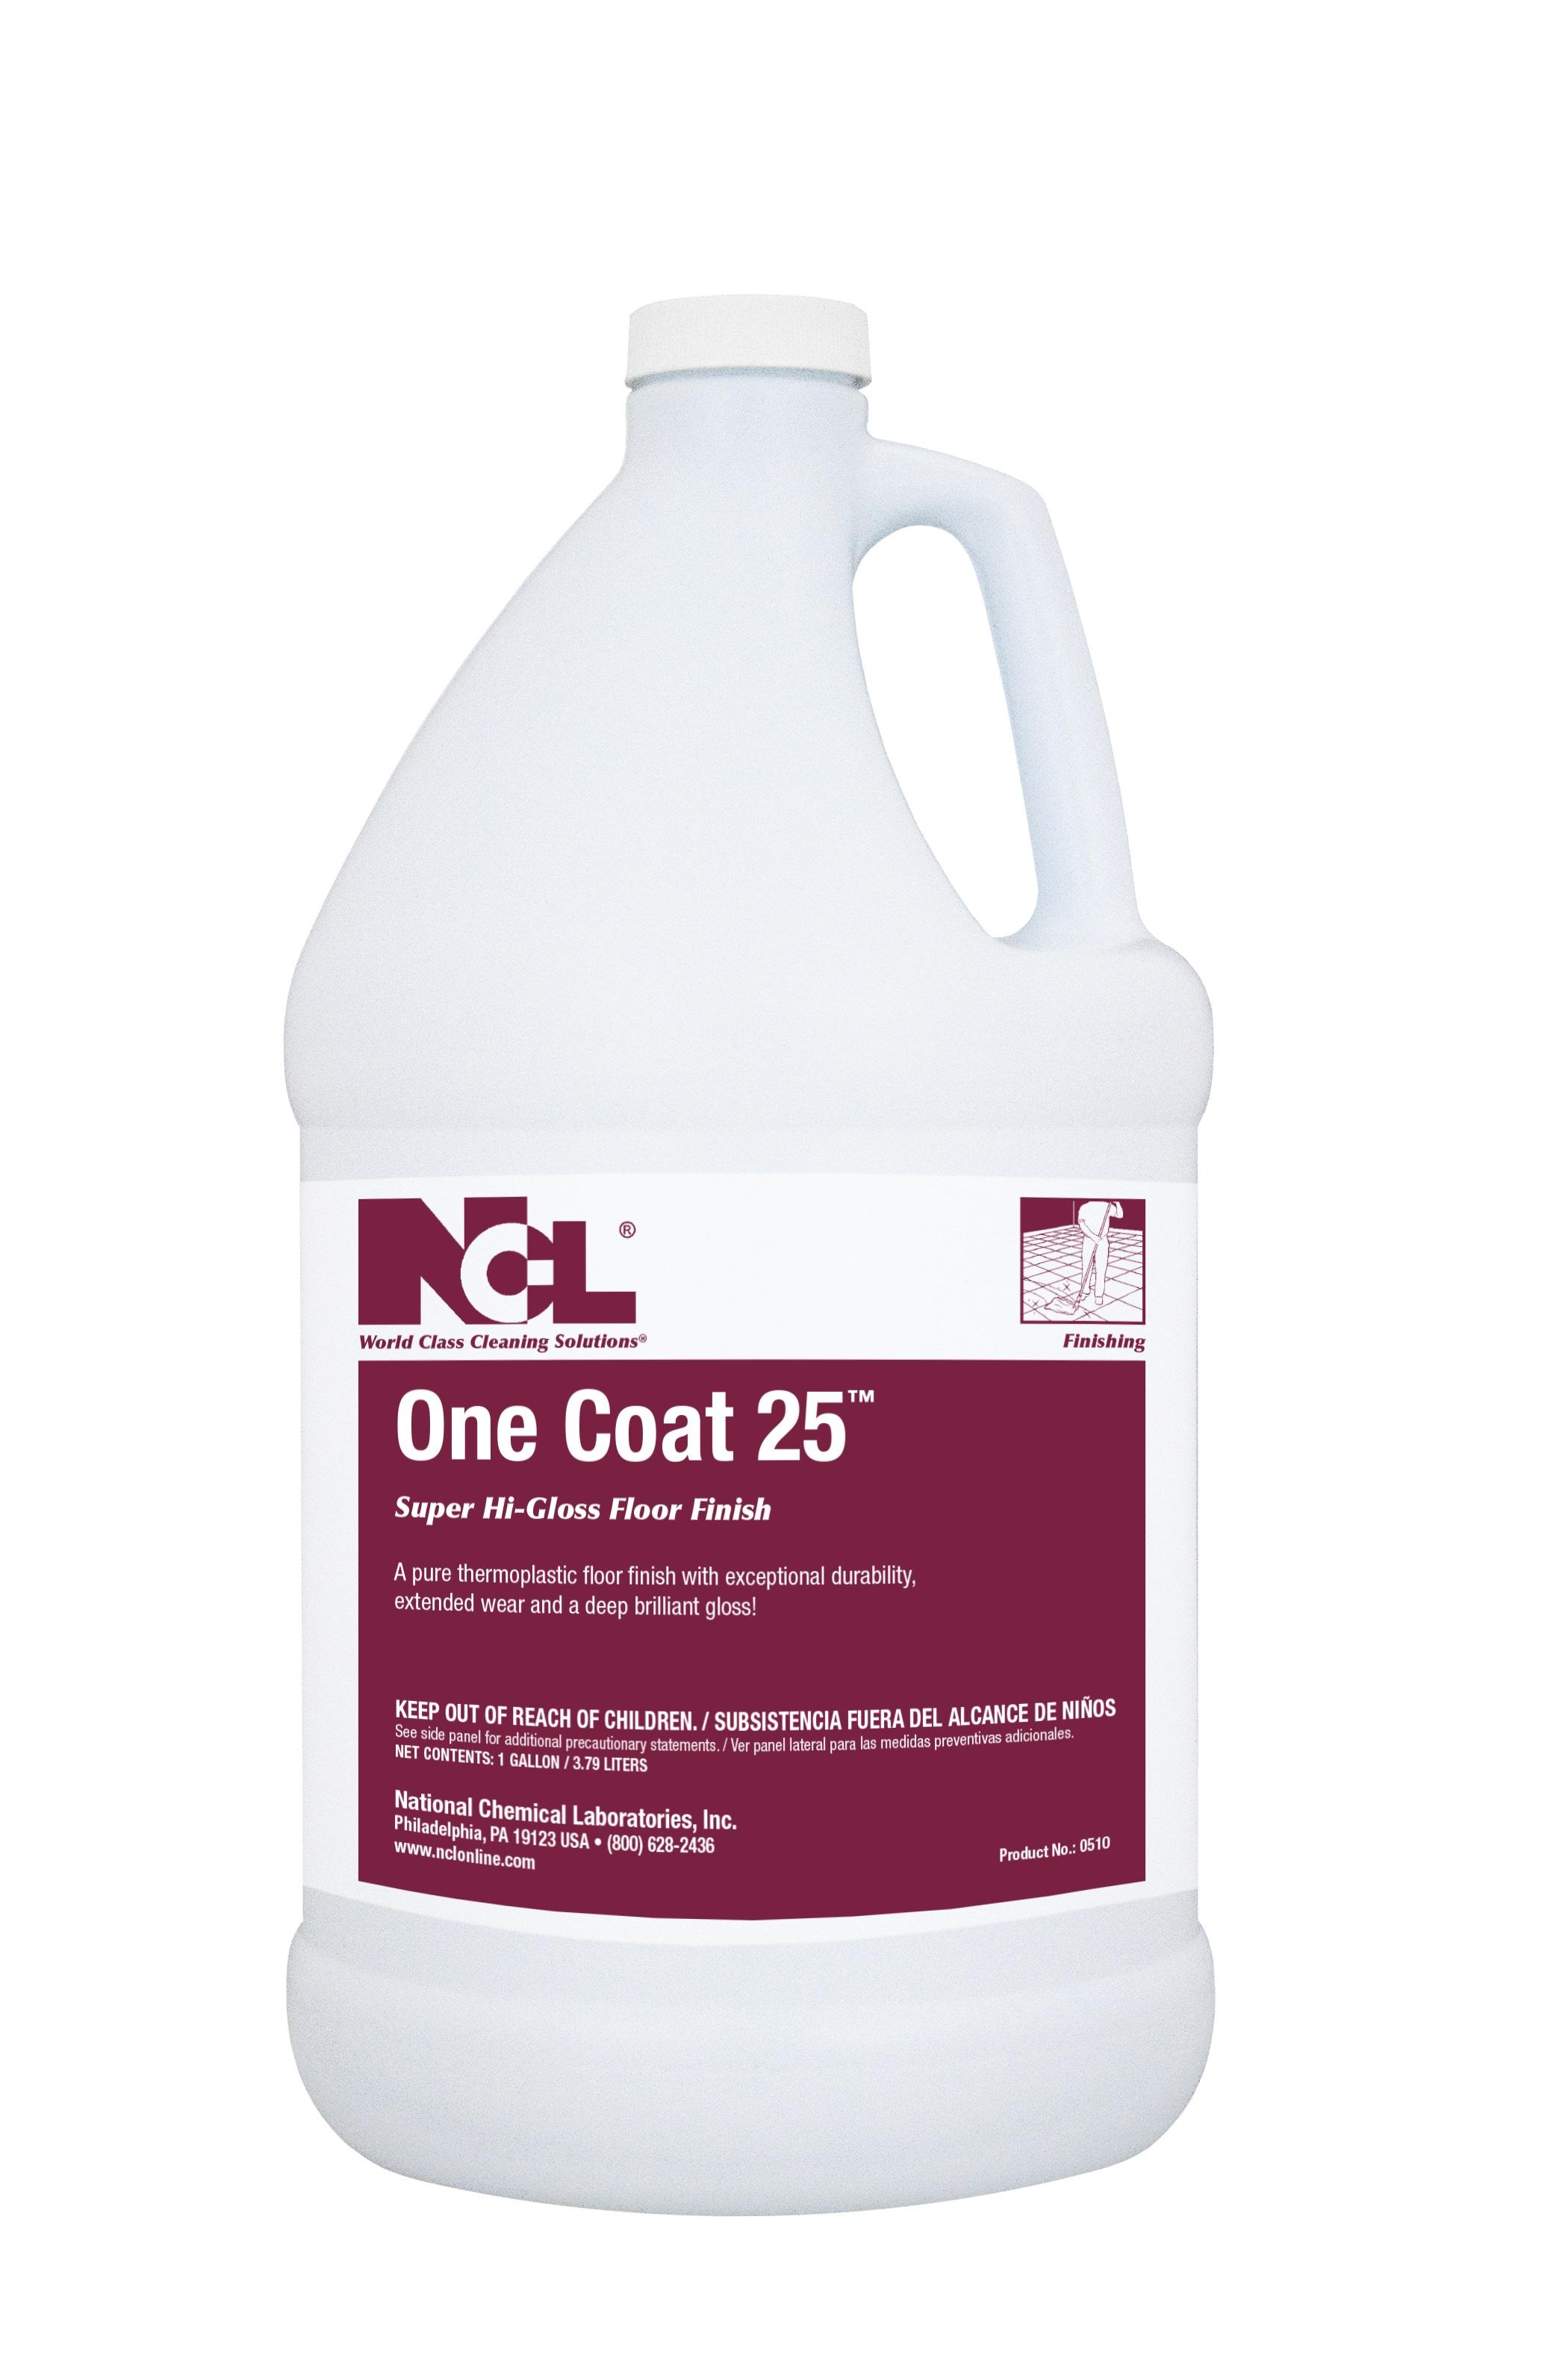 Ncl One Coat 25 Super High Gloss Floor Finish 5gal